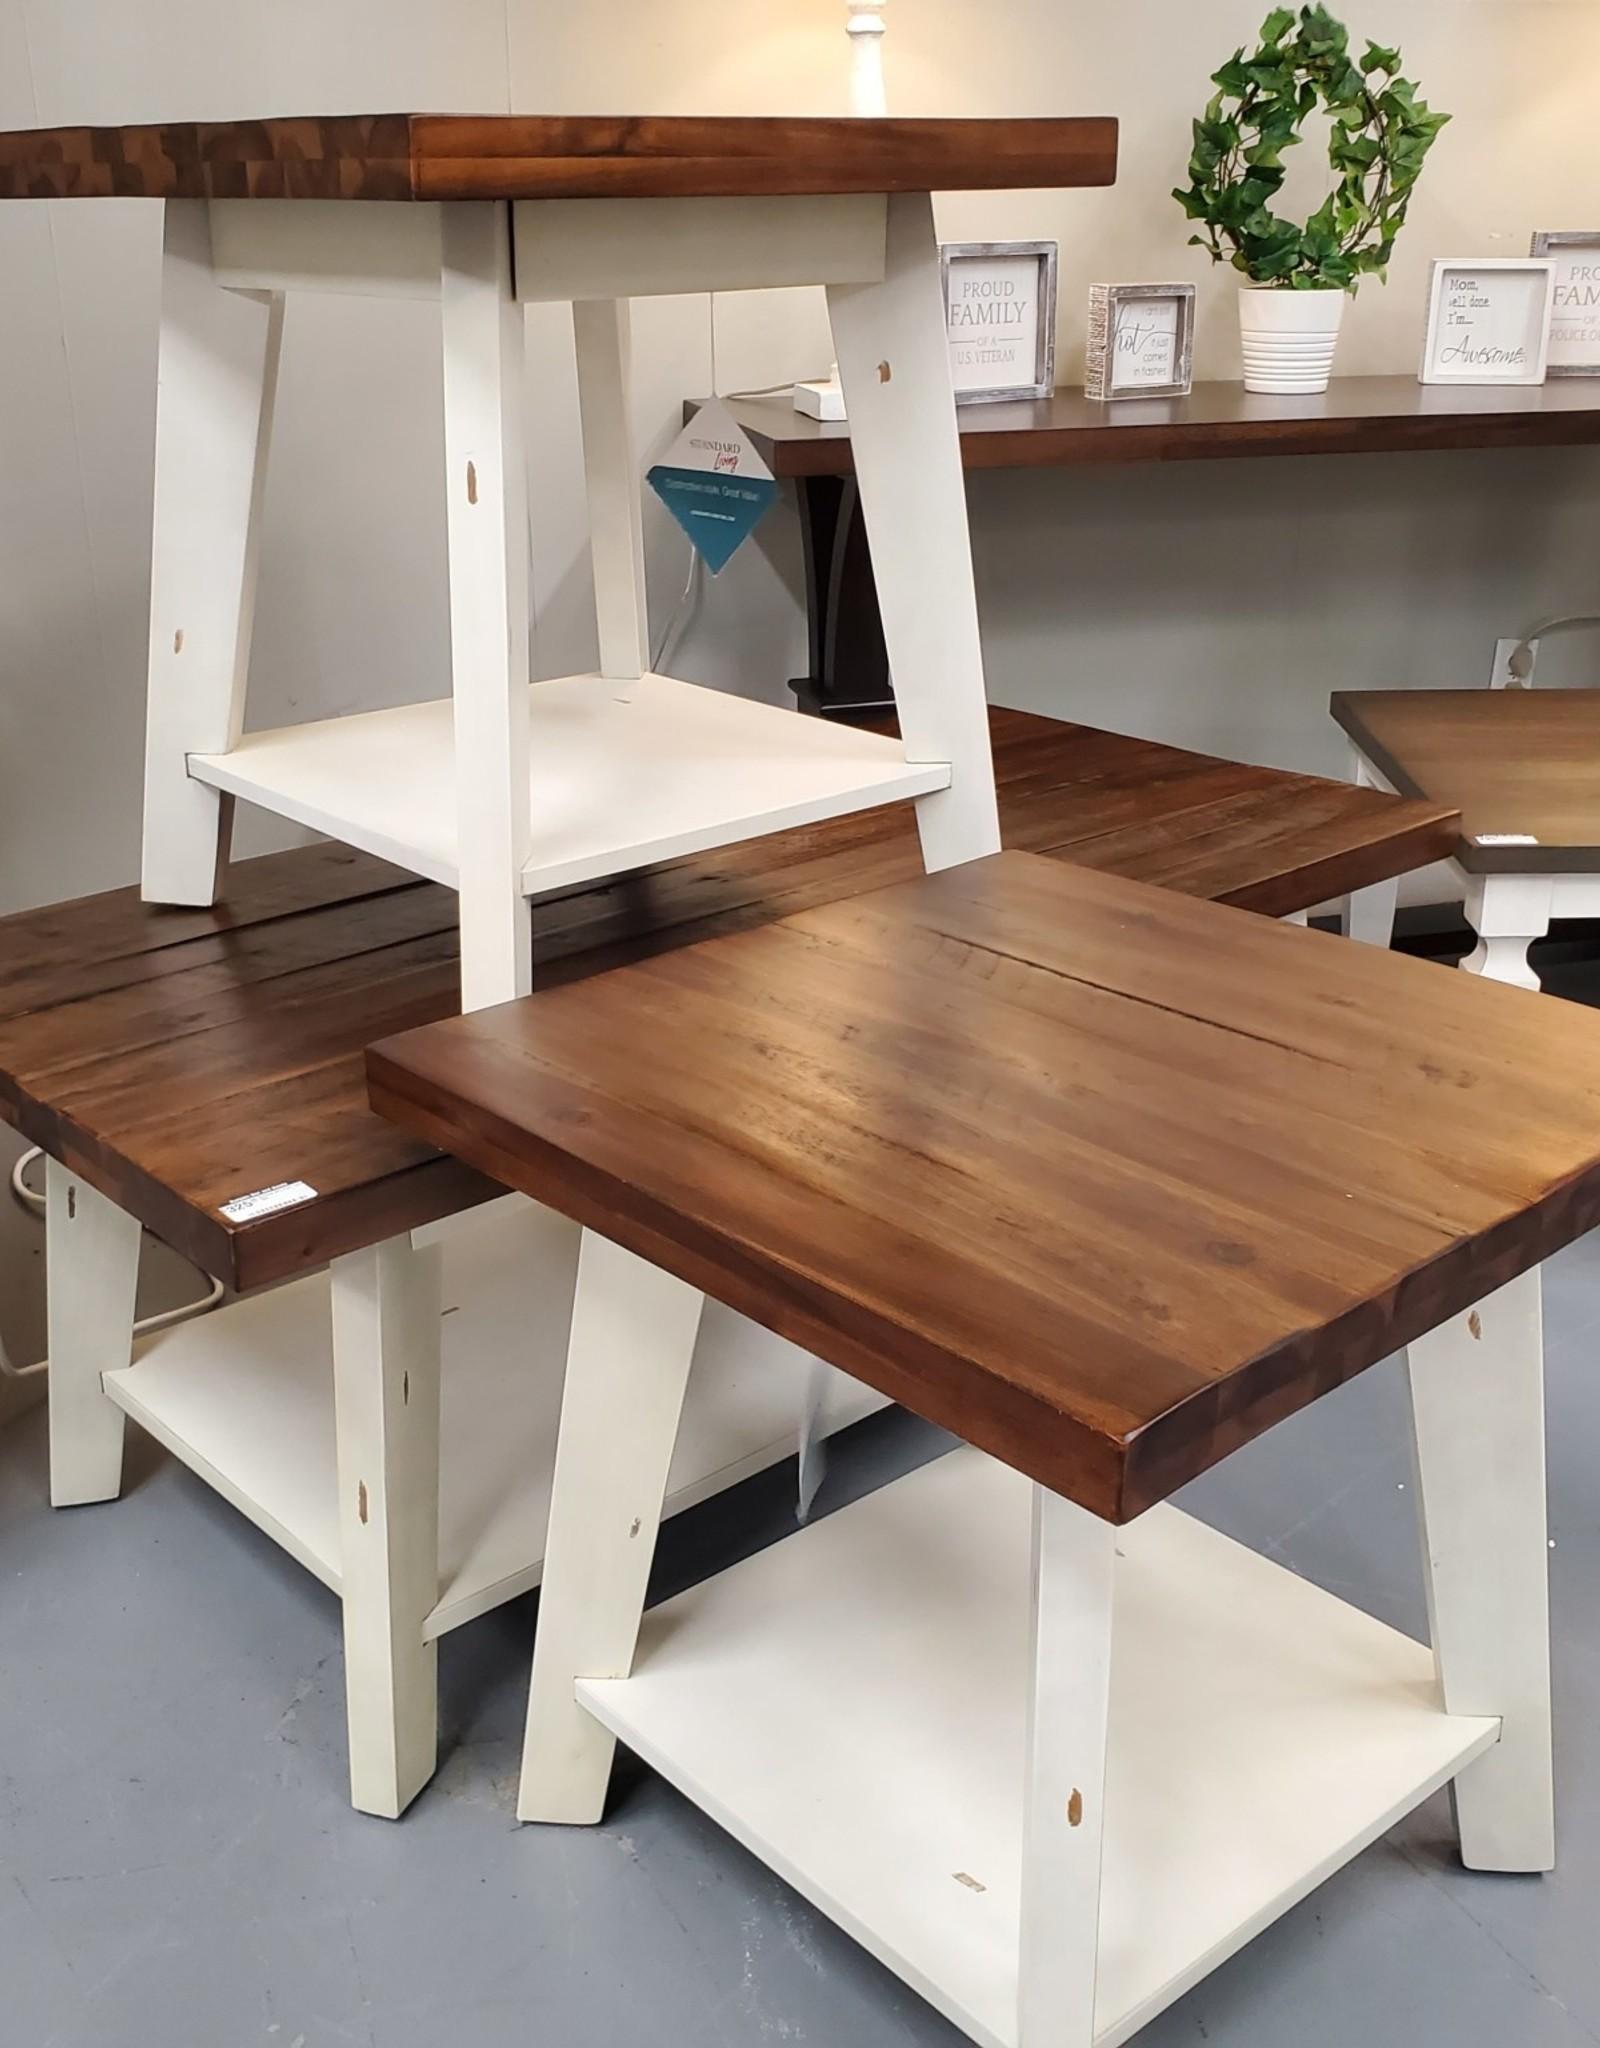 Standard Furniture Amelia 3PC End Table Set